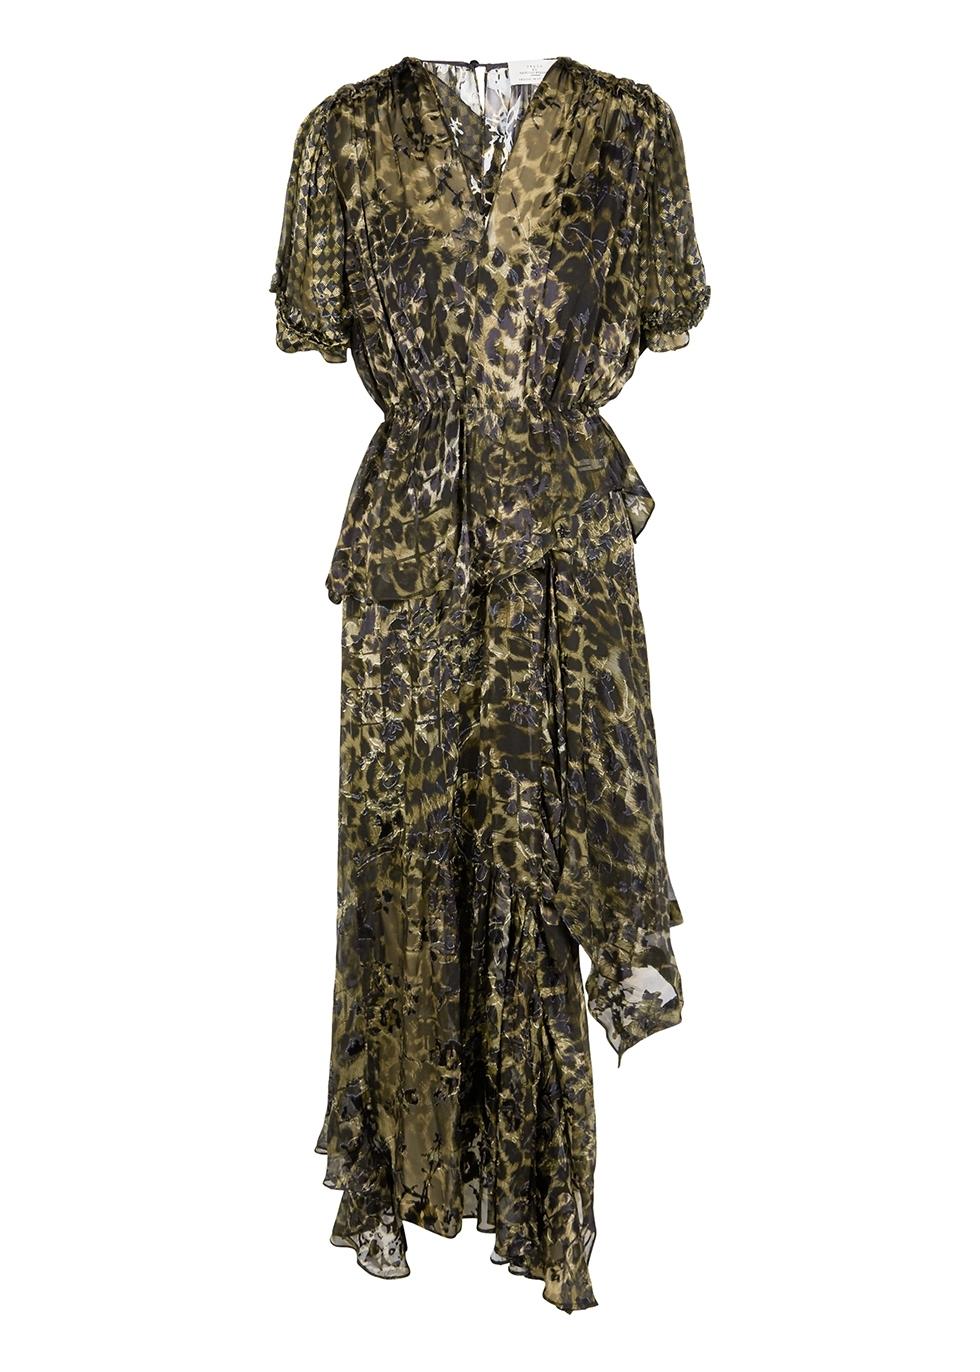 cf5c5f97659e Women's Designer Clothing, Shoes and Bags - Harvey Nichols